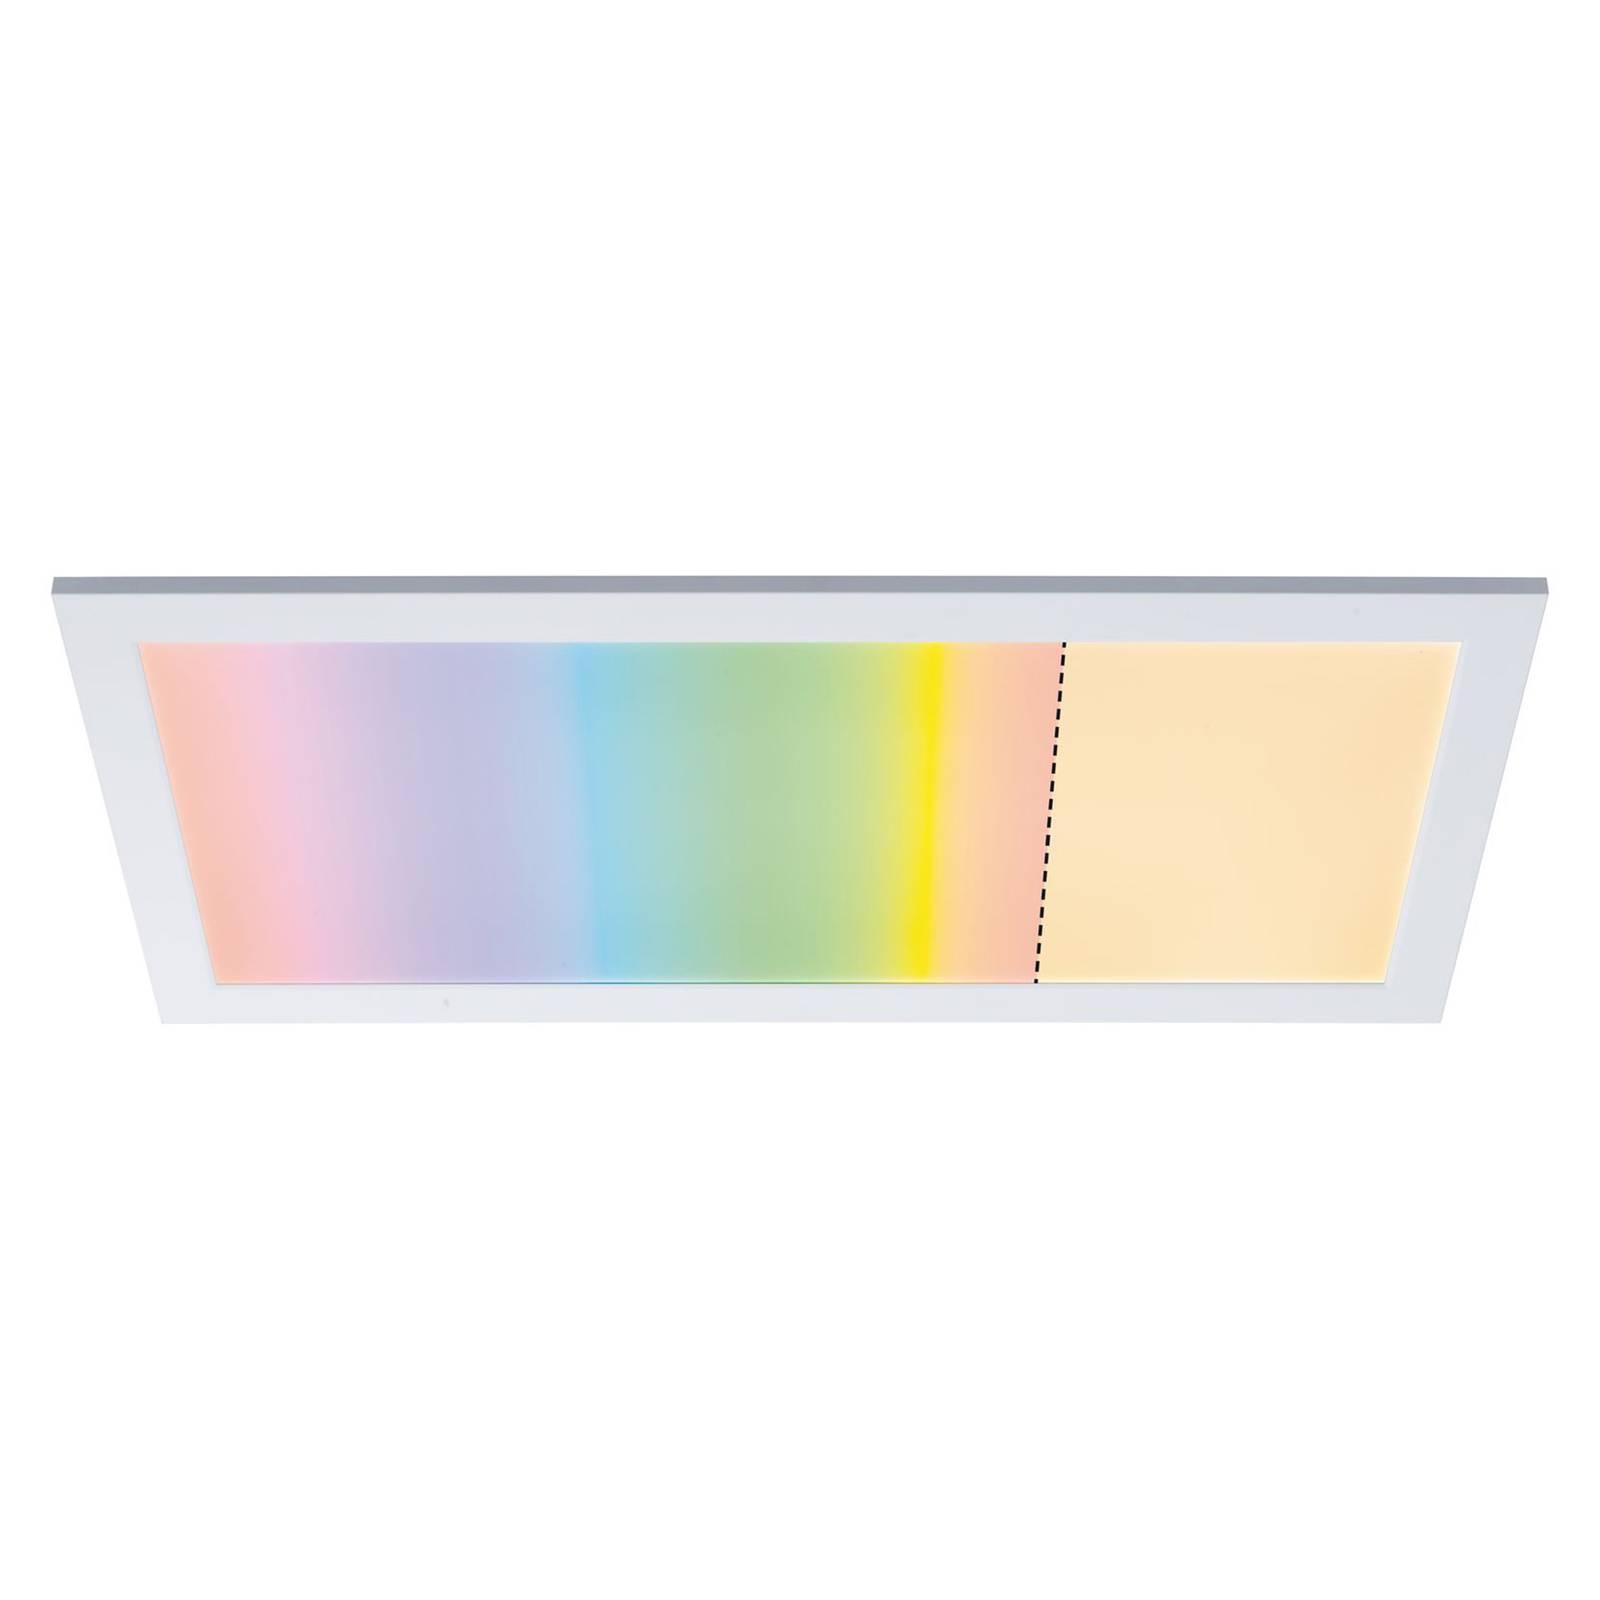 Paulmann Amaris LED-paneeli, ZigBee, 60x30cm, RGBW